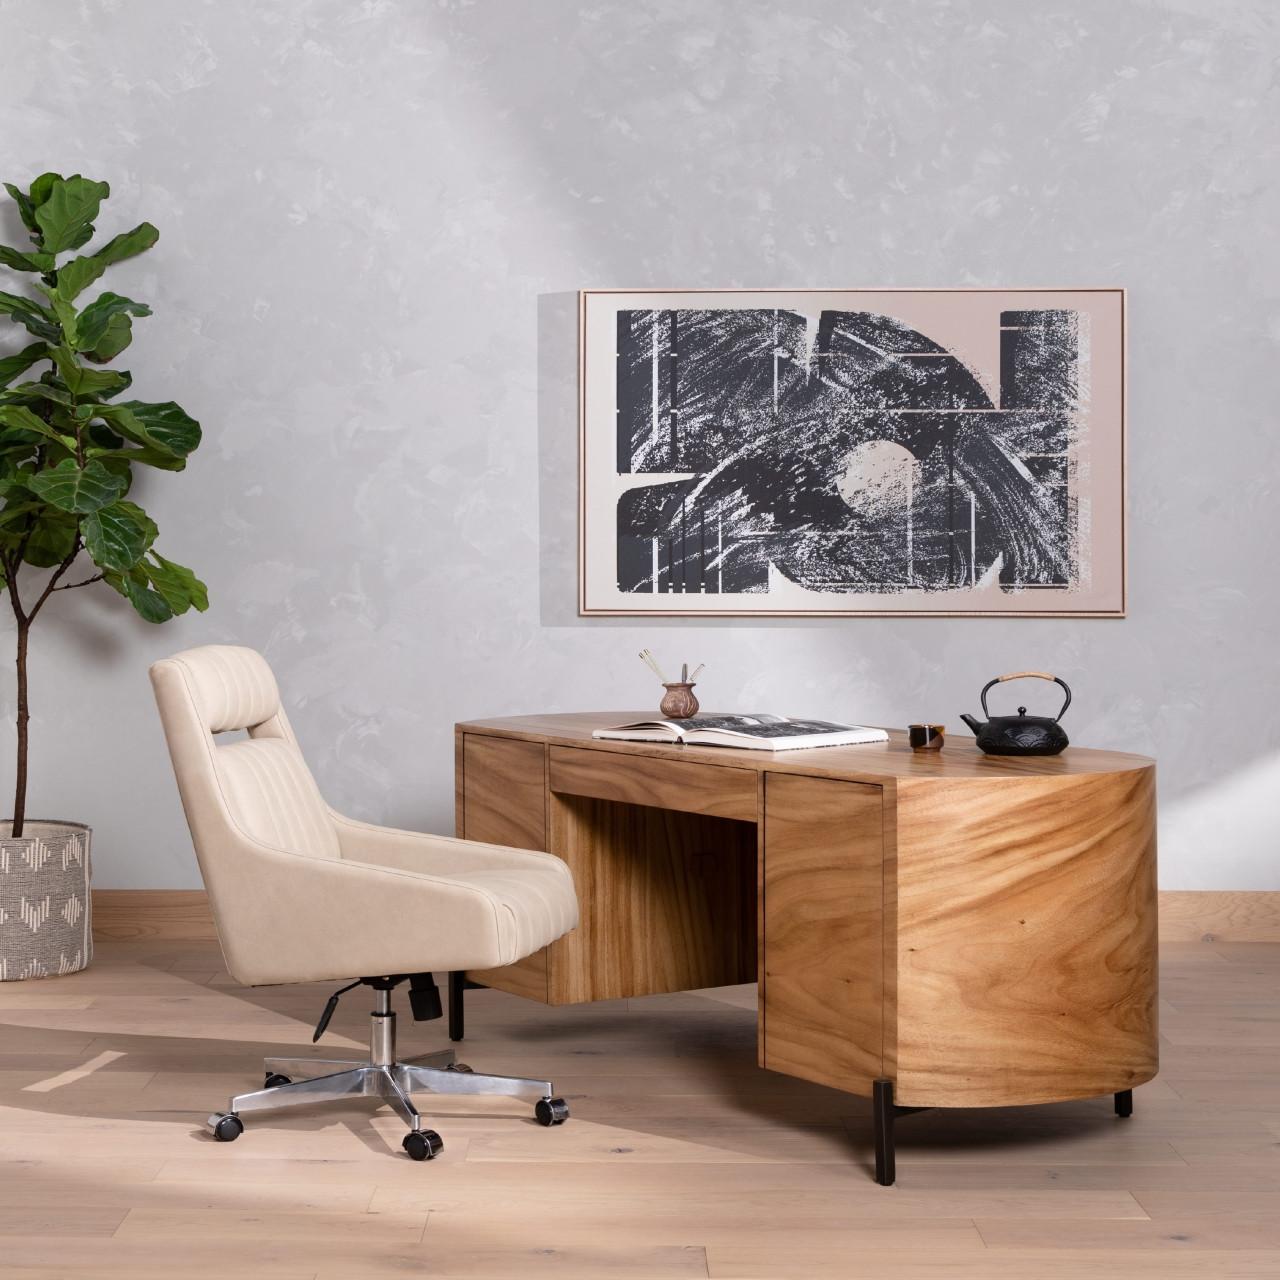 Luke Executive Desk - Gold Guanacaste